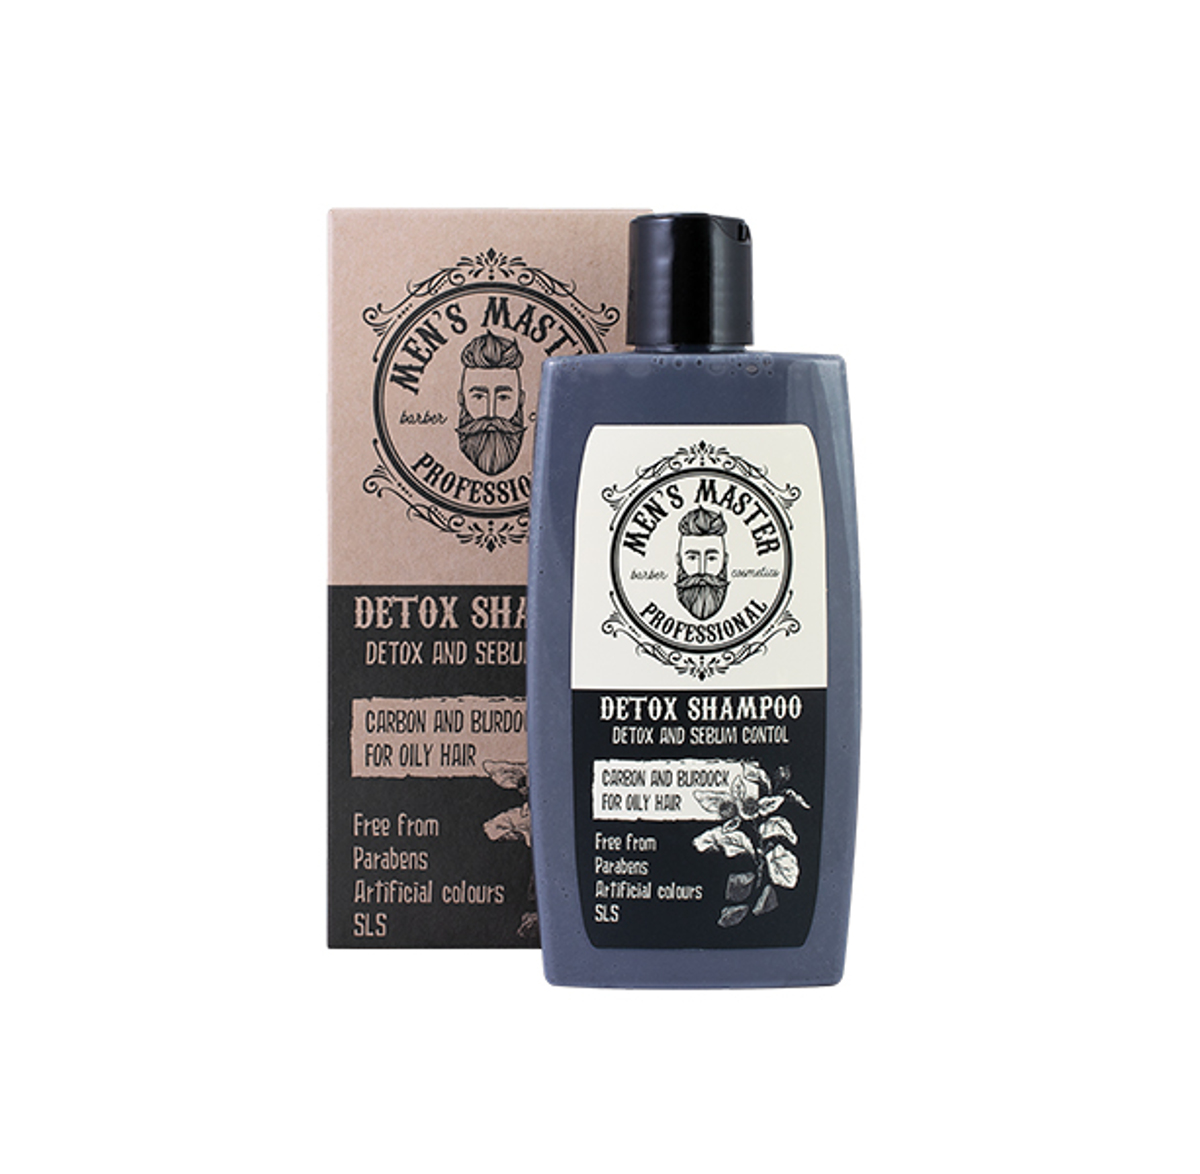 Detoxifying Hair Loss Shampoo Men's Master Professional